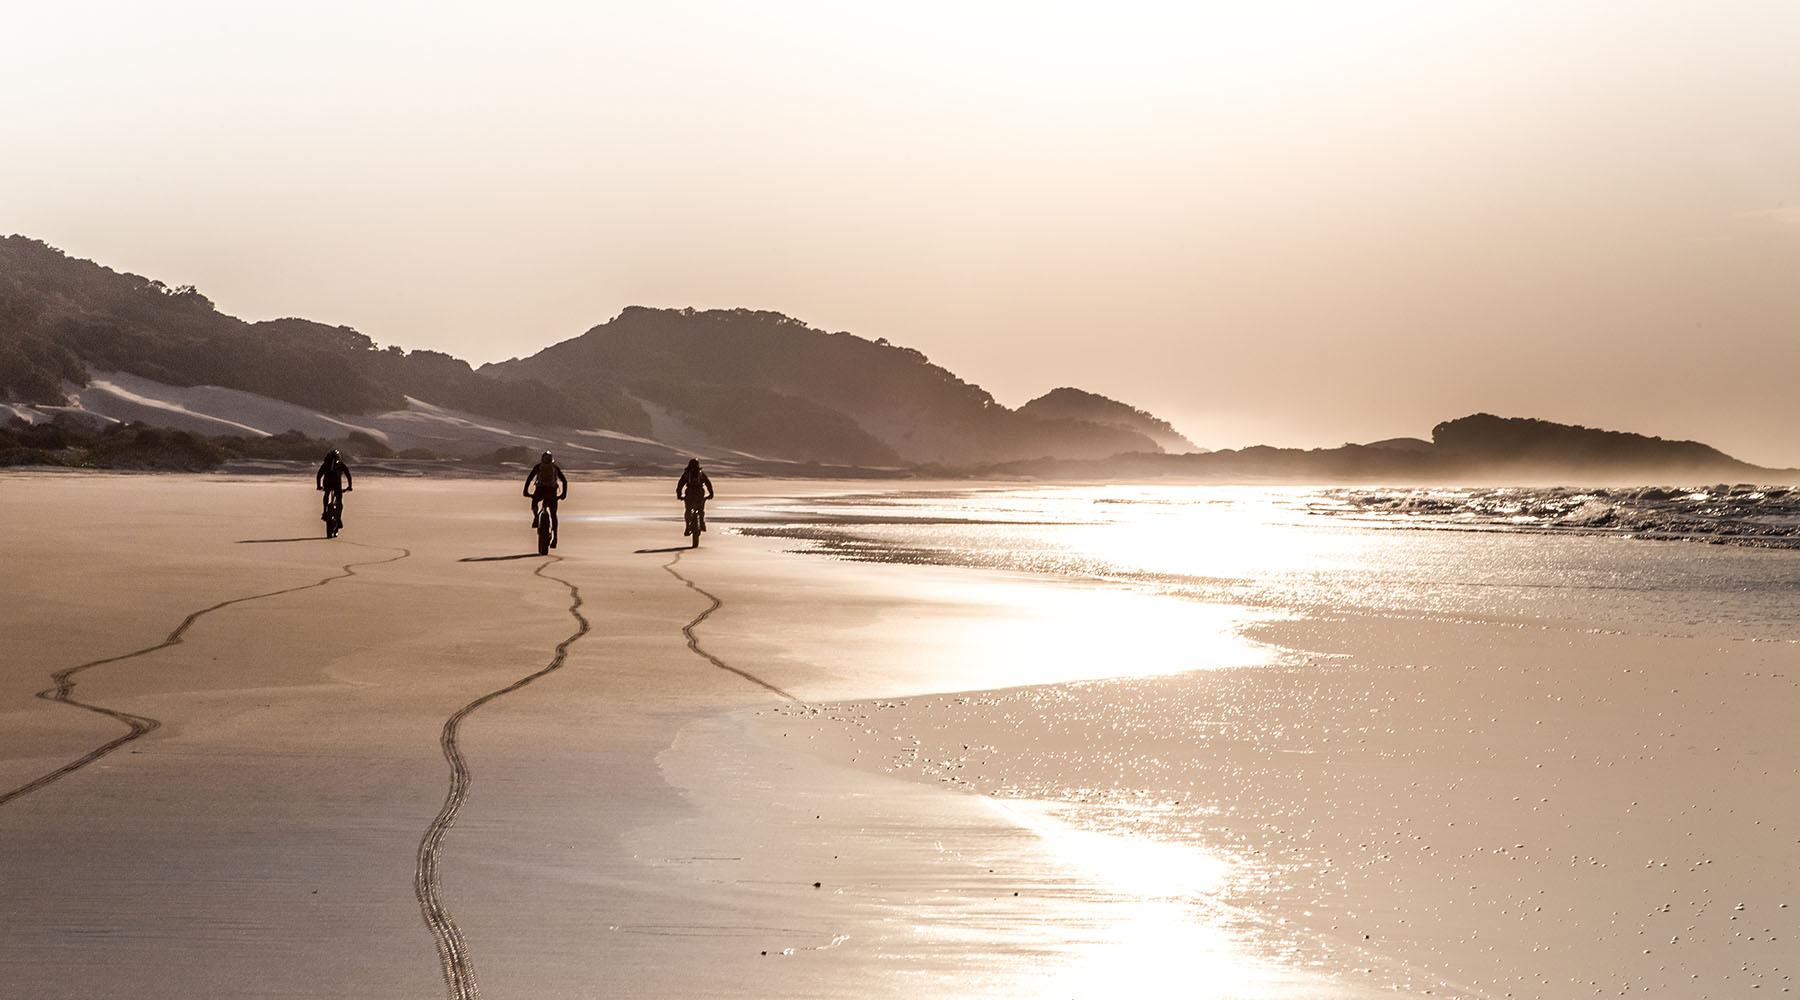 wild-coast-amble-mountain-biking-fat-bikes-detour-trails-south-africa